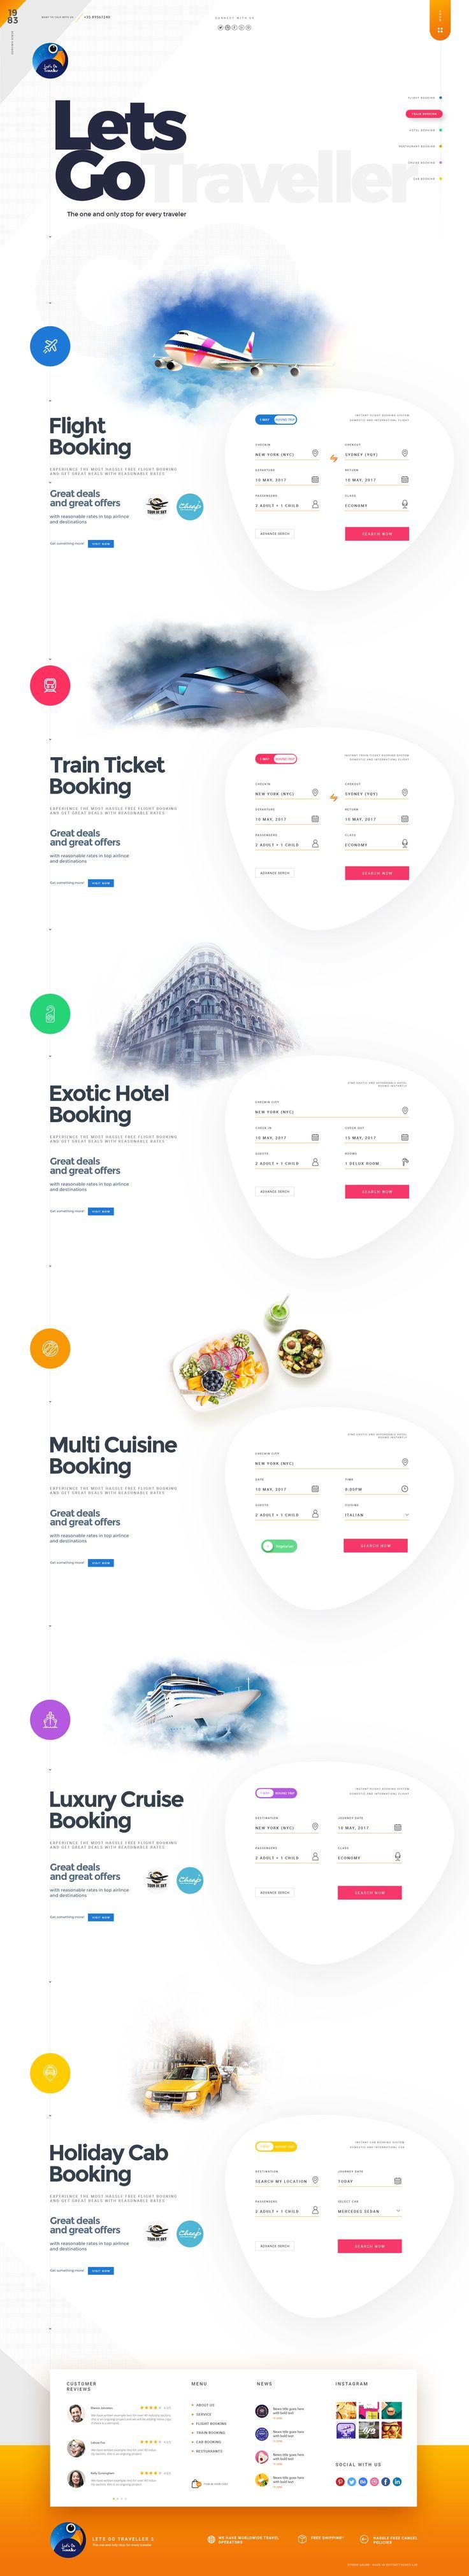 Let's GO Traveller 2 | A Multipurpose Travel Template #hotels #planyourholiday #restaurants • Download ➝ https://themeforest.net/item/lets-go-traveller-2-a-multipurpose-travel-template/21298968?ref=pxcr